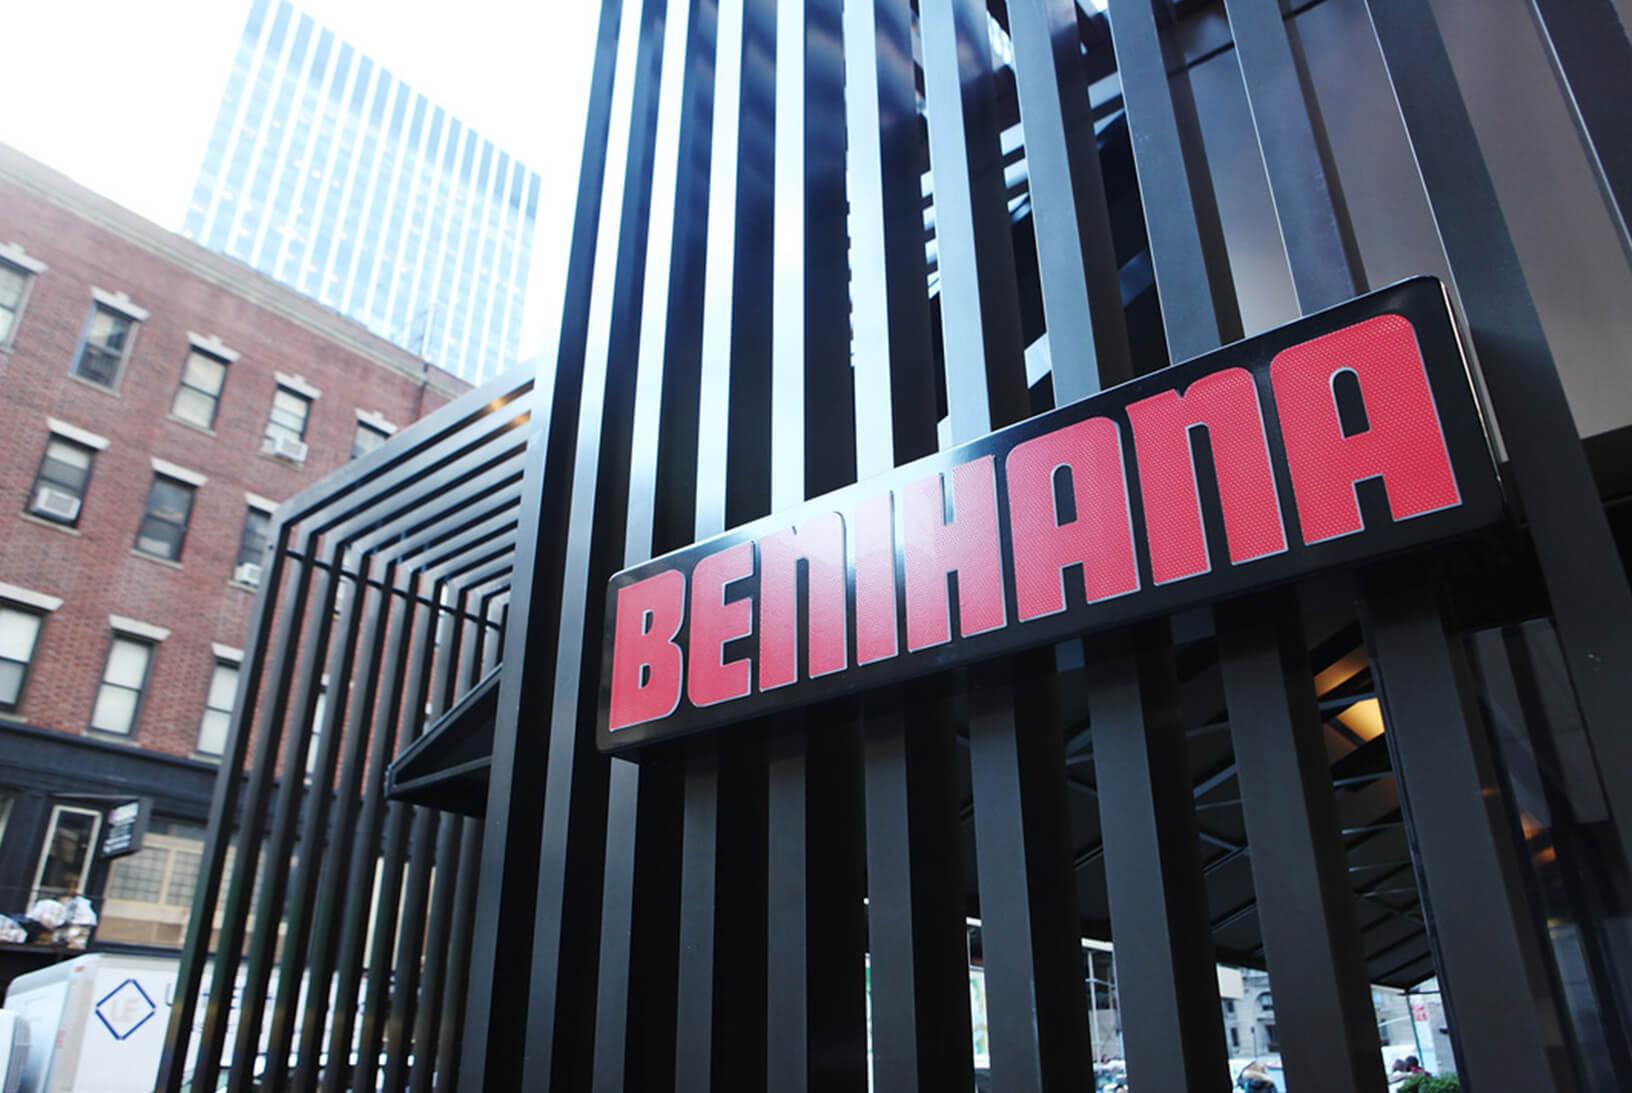 Sushi Japanese Steakhouse New York Ny Restaurant Benihana